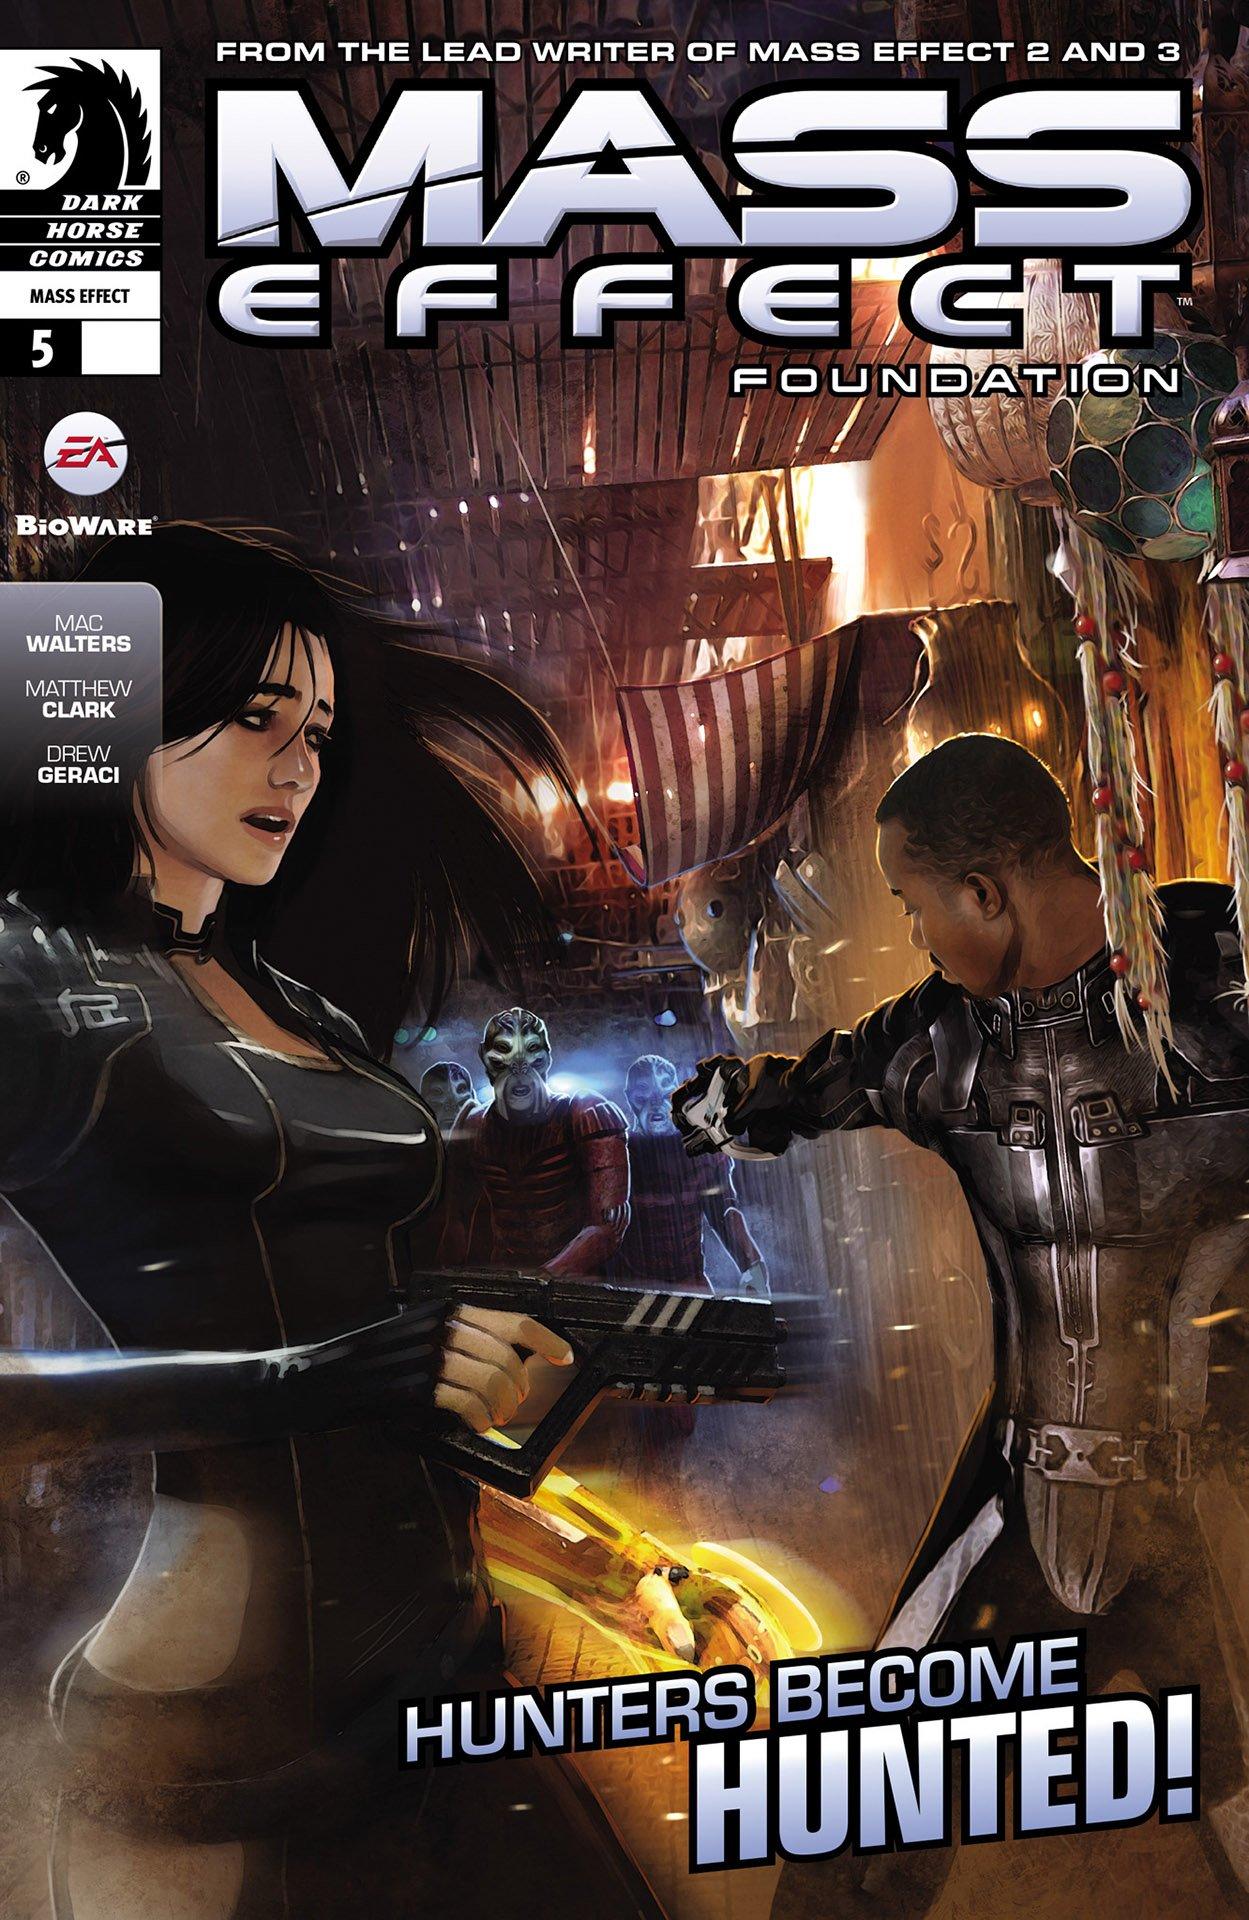 Mass Effect - Foundation 005 (November 2013)